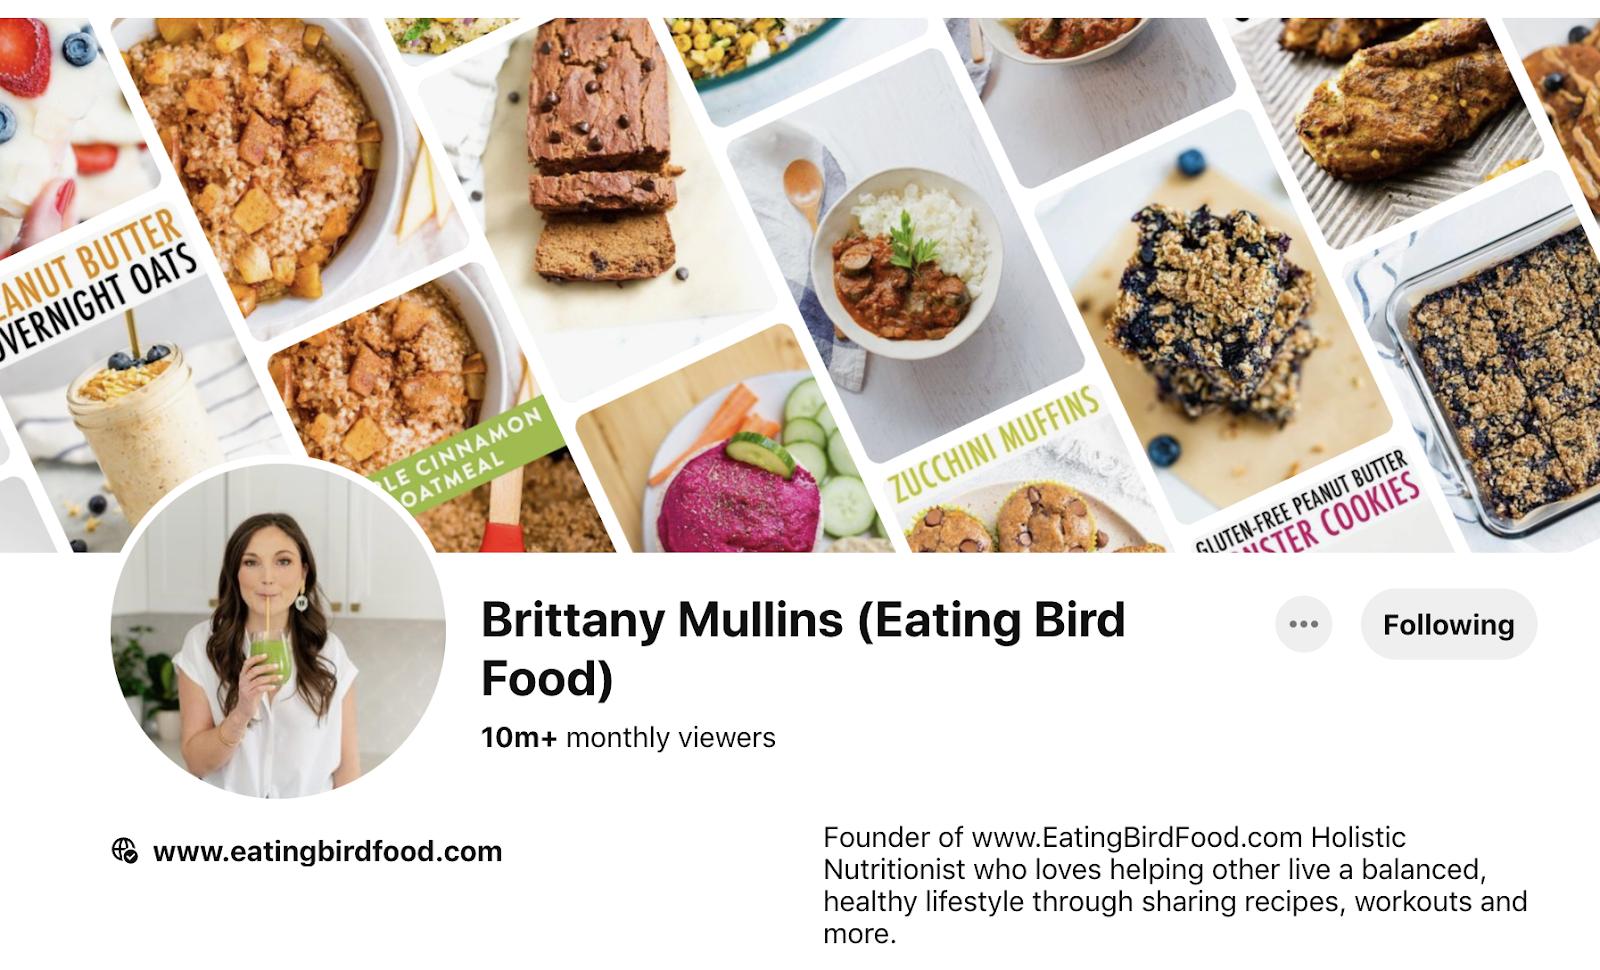 Brittany Mullins Eating Bird food